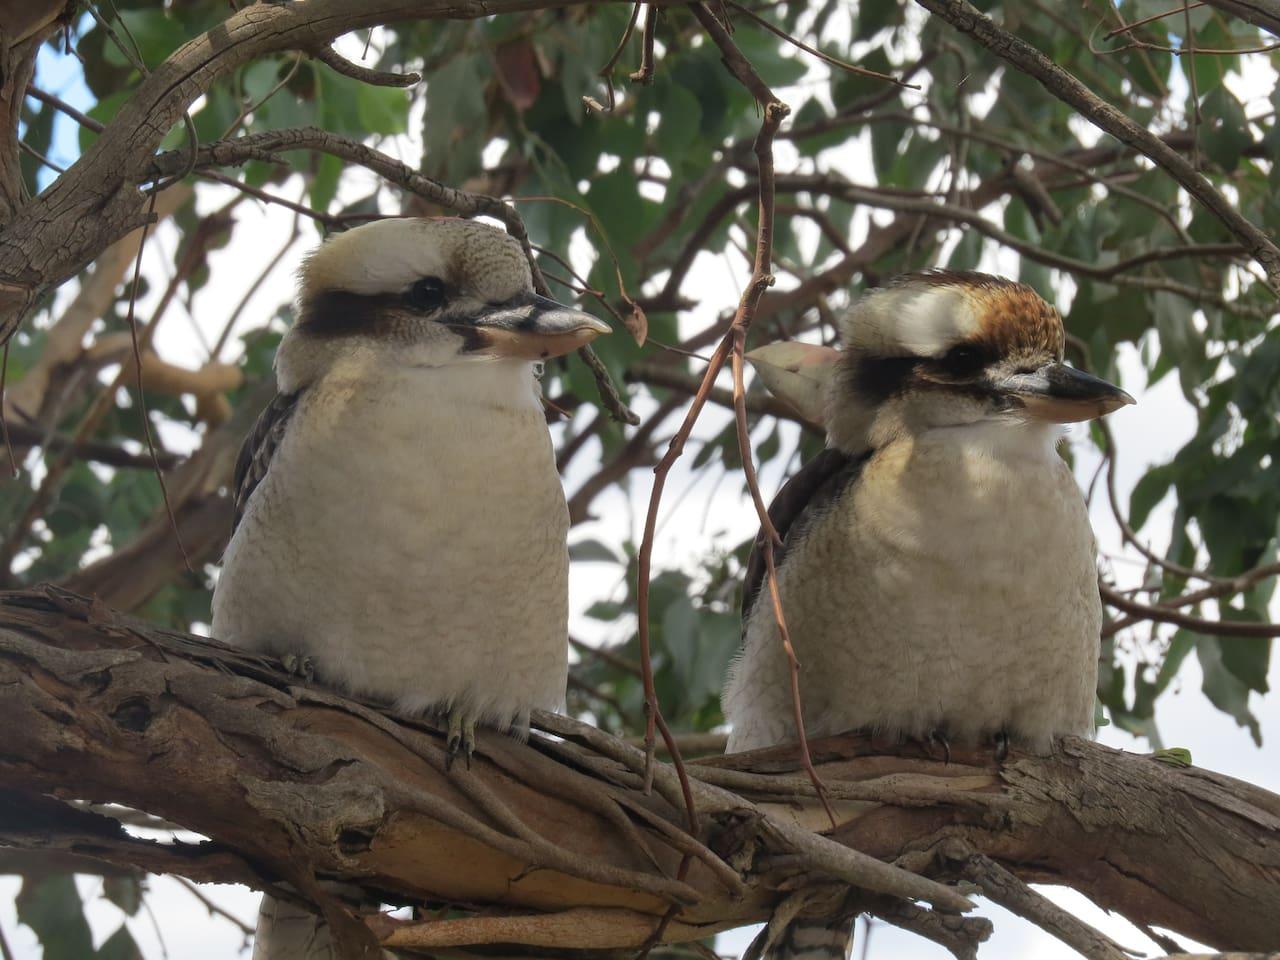 Kookaburra's in the trees nearby.